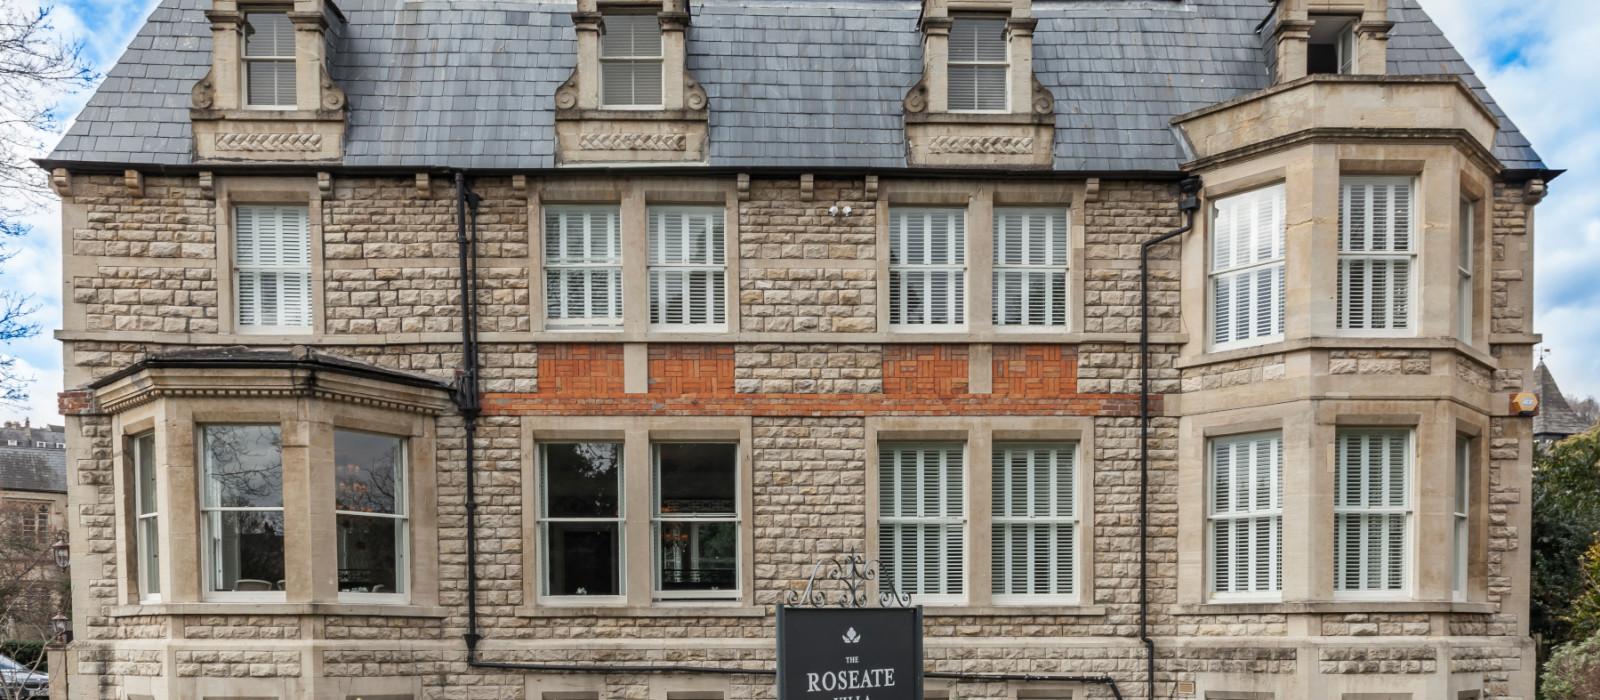 Hotel The Roseate Villa Bath UK & Ireland